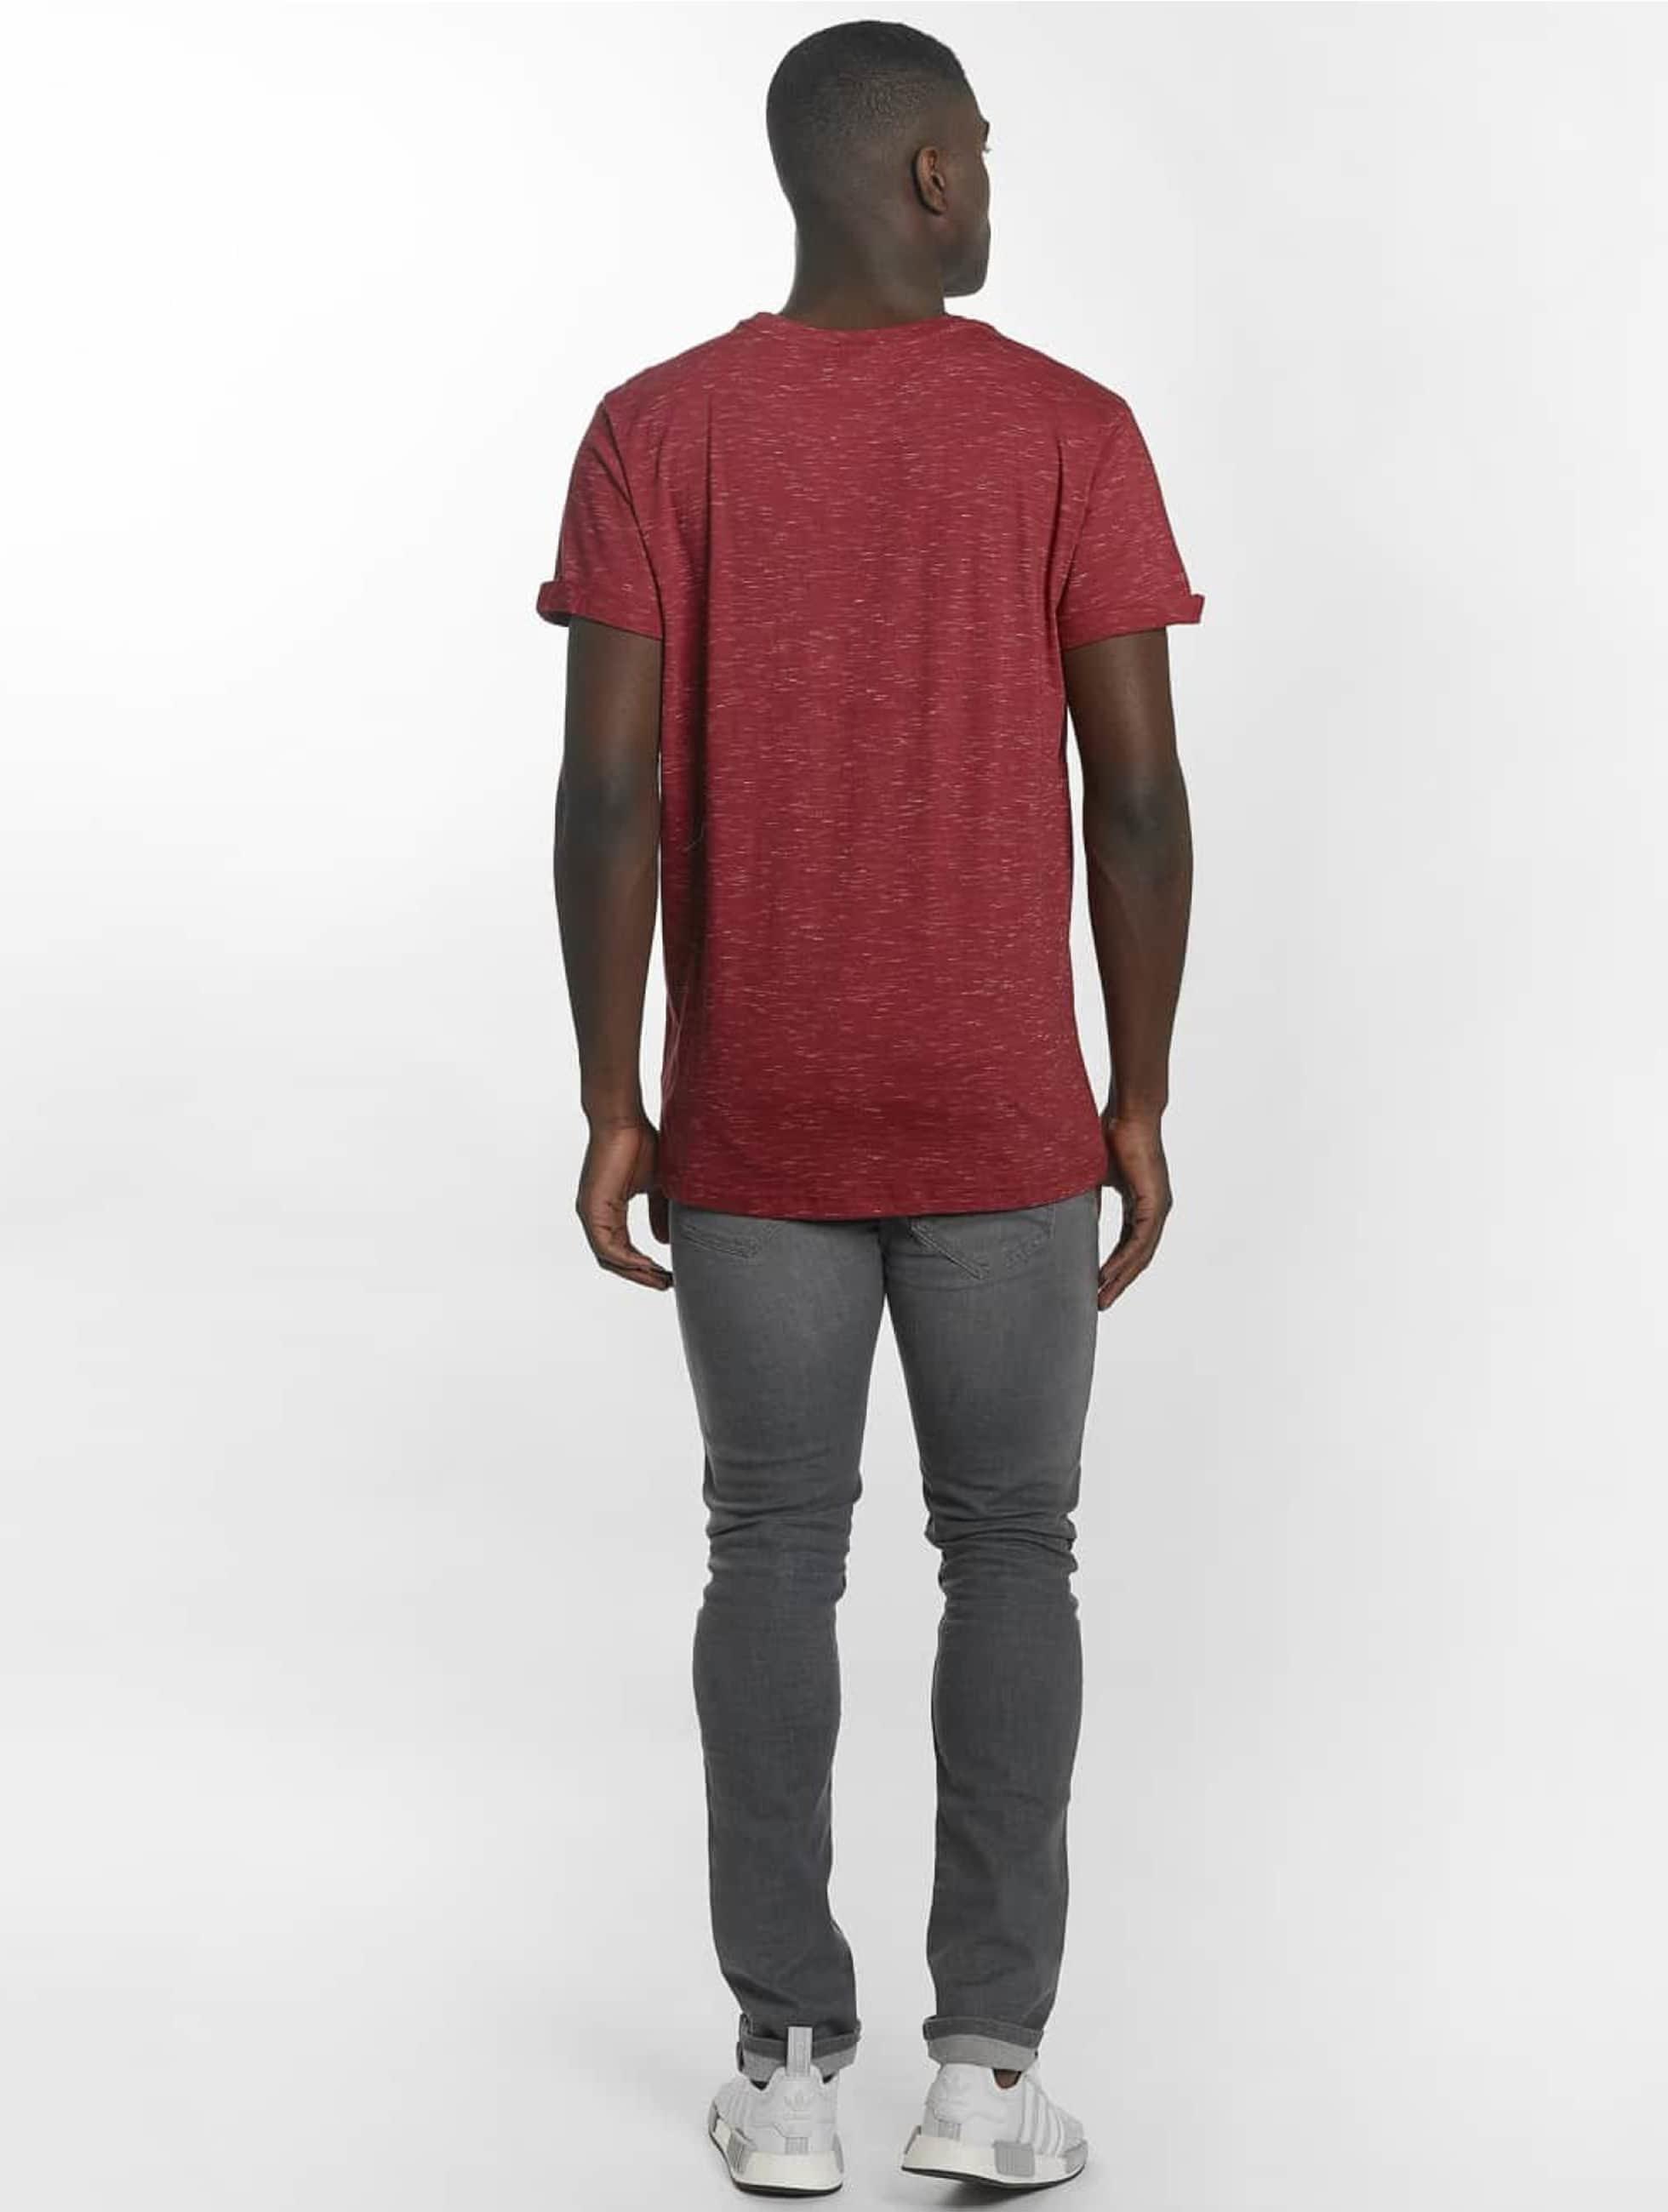 Urban Classics Camiseta Space Dye Turnup rojo